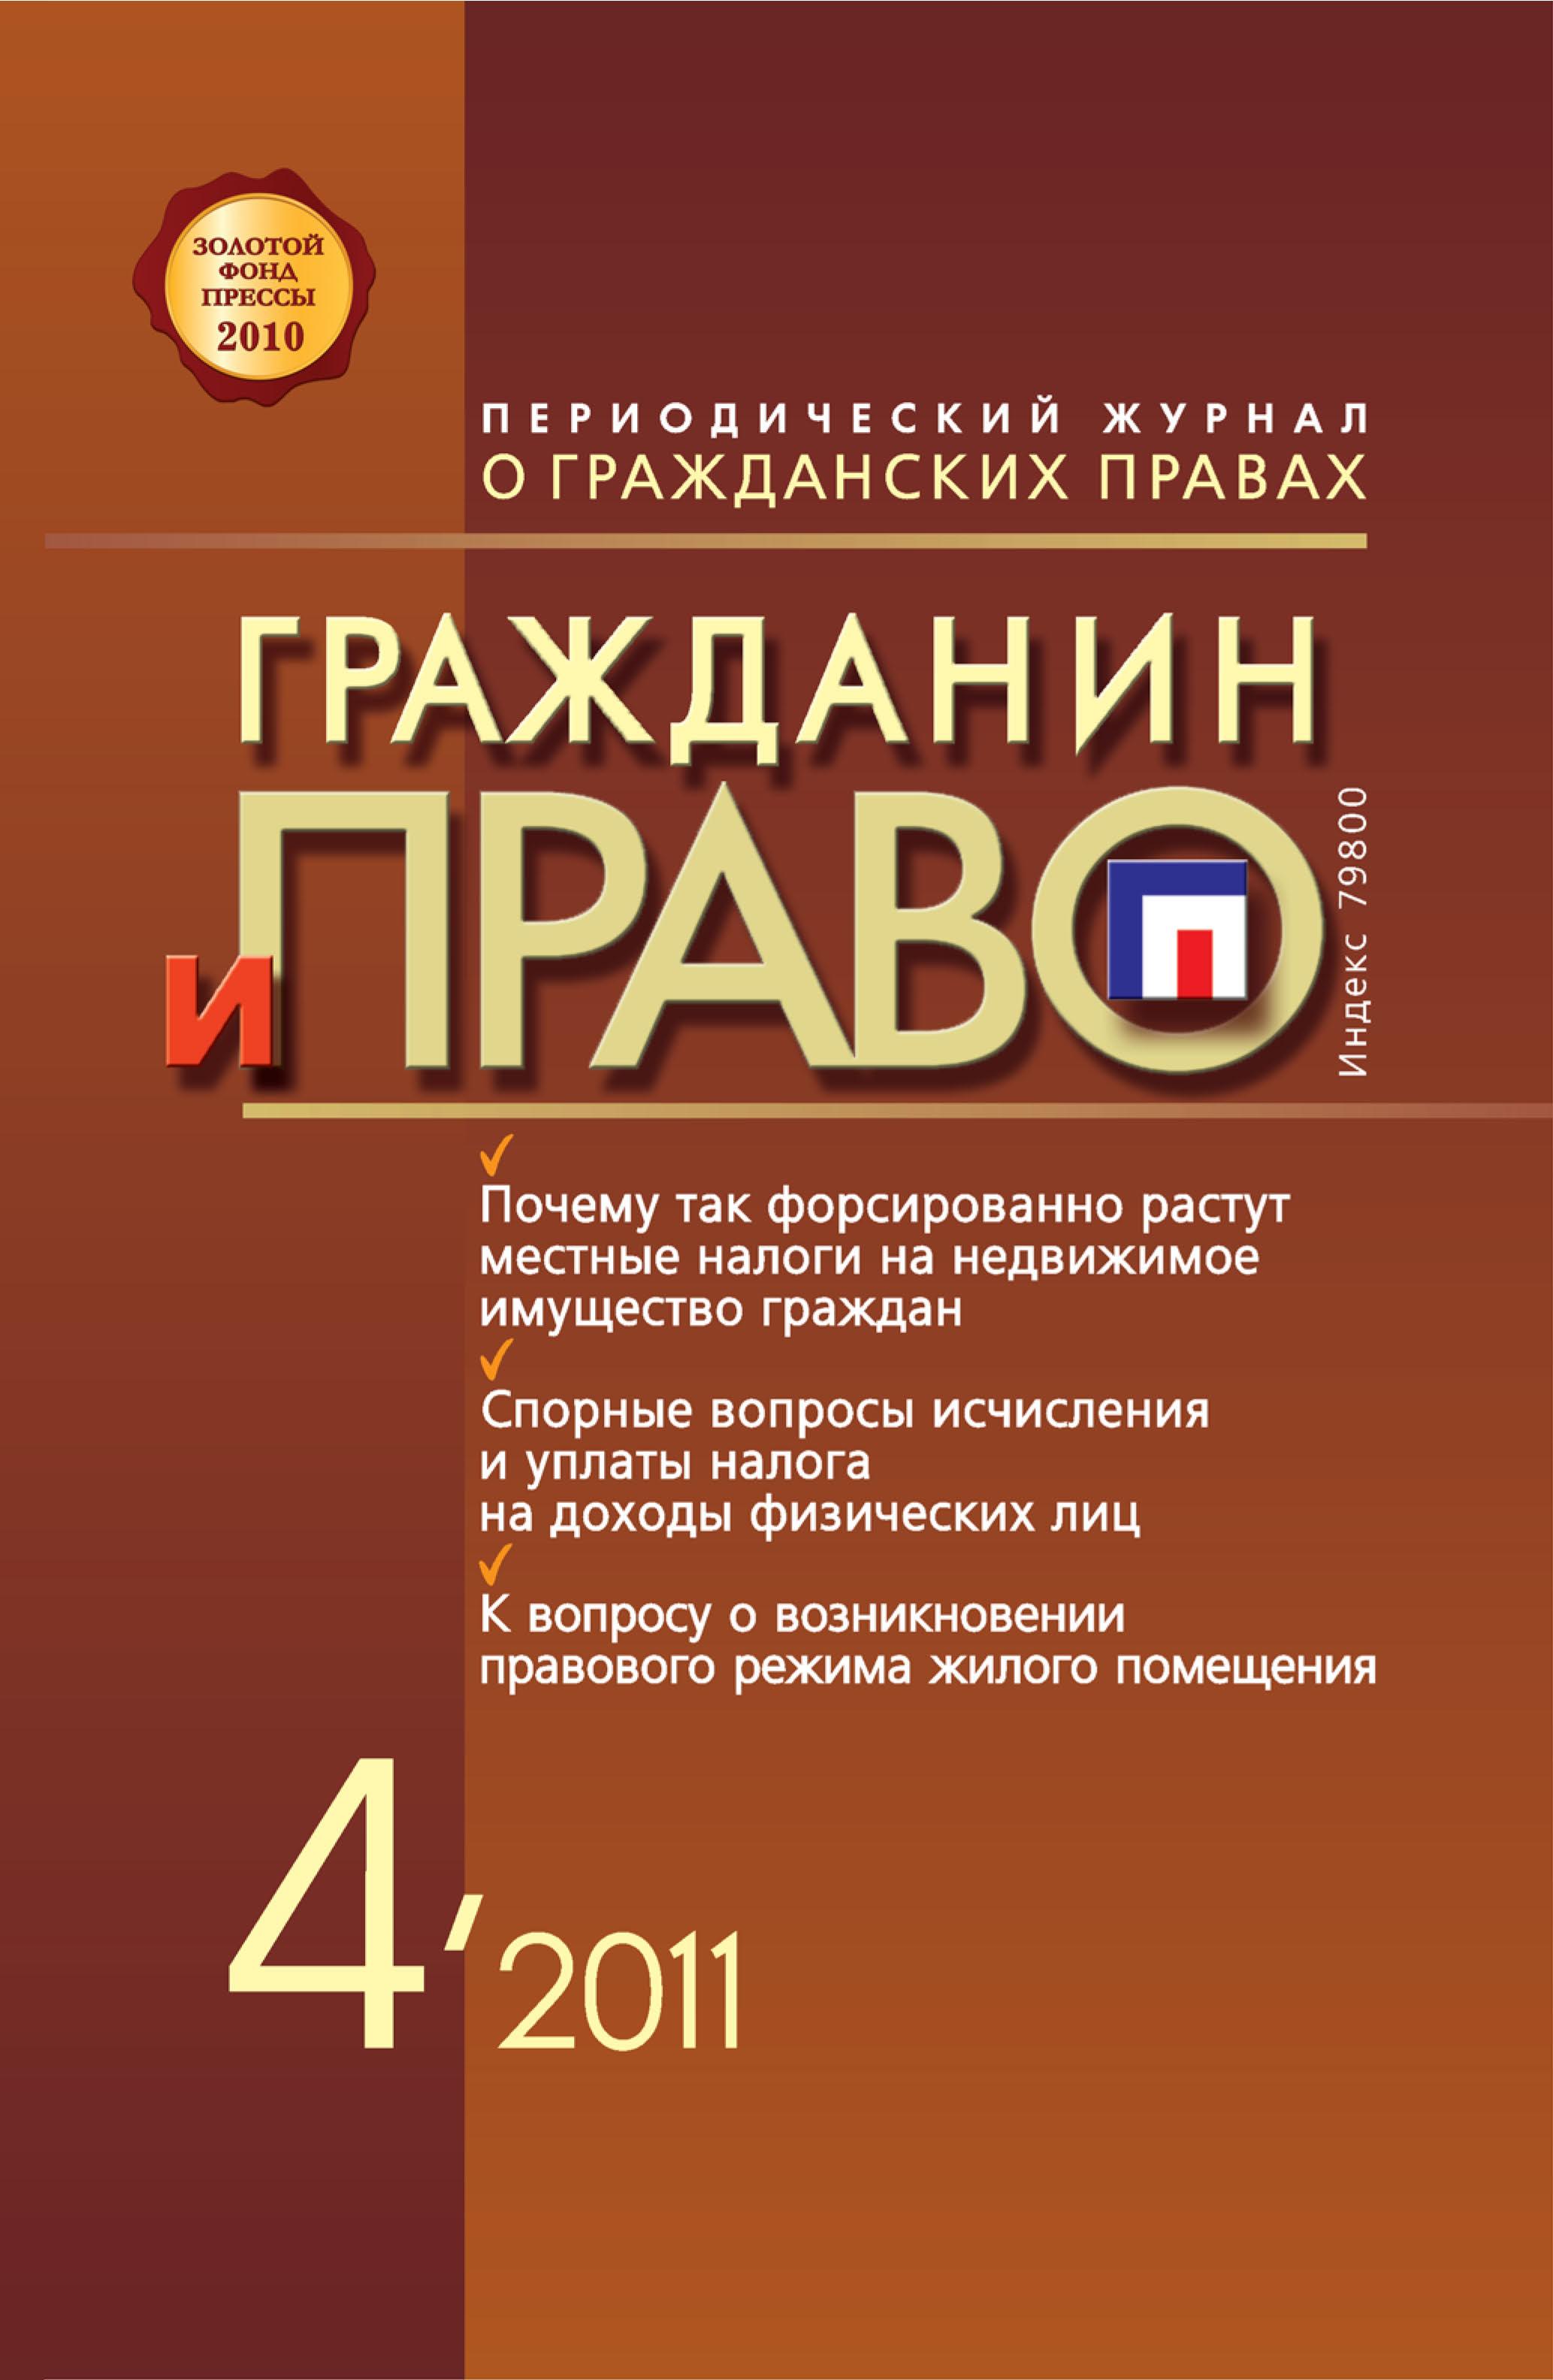 Гражданин и право №04/2011